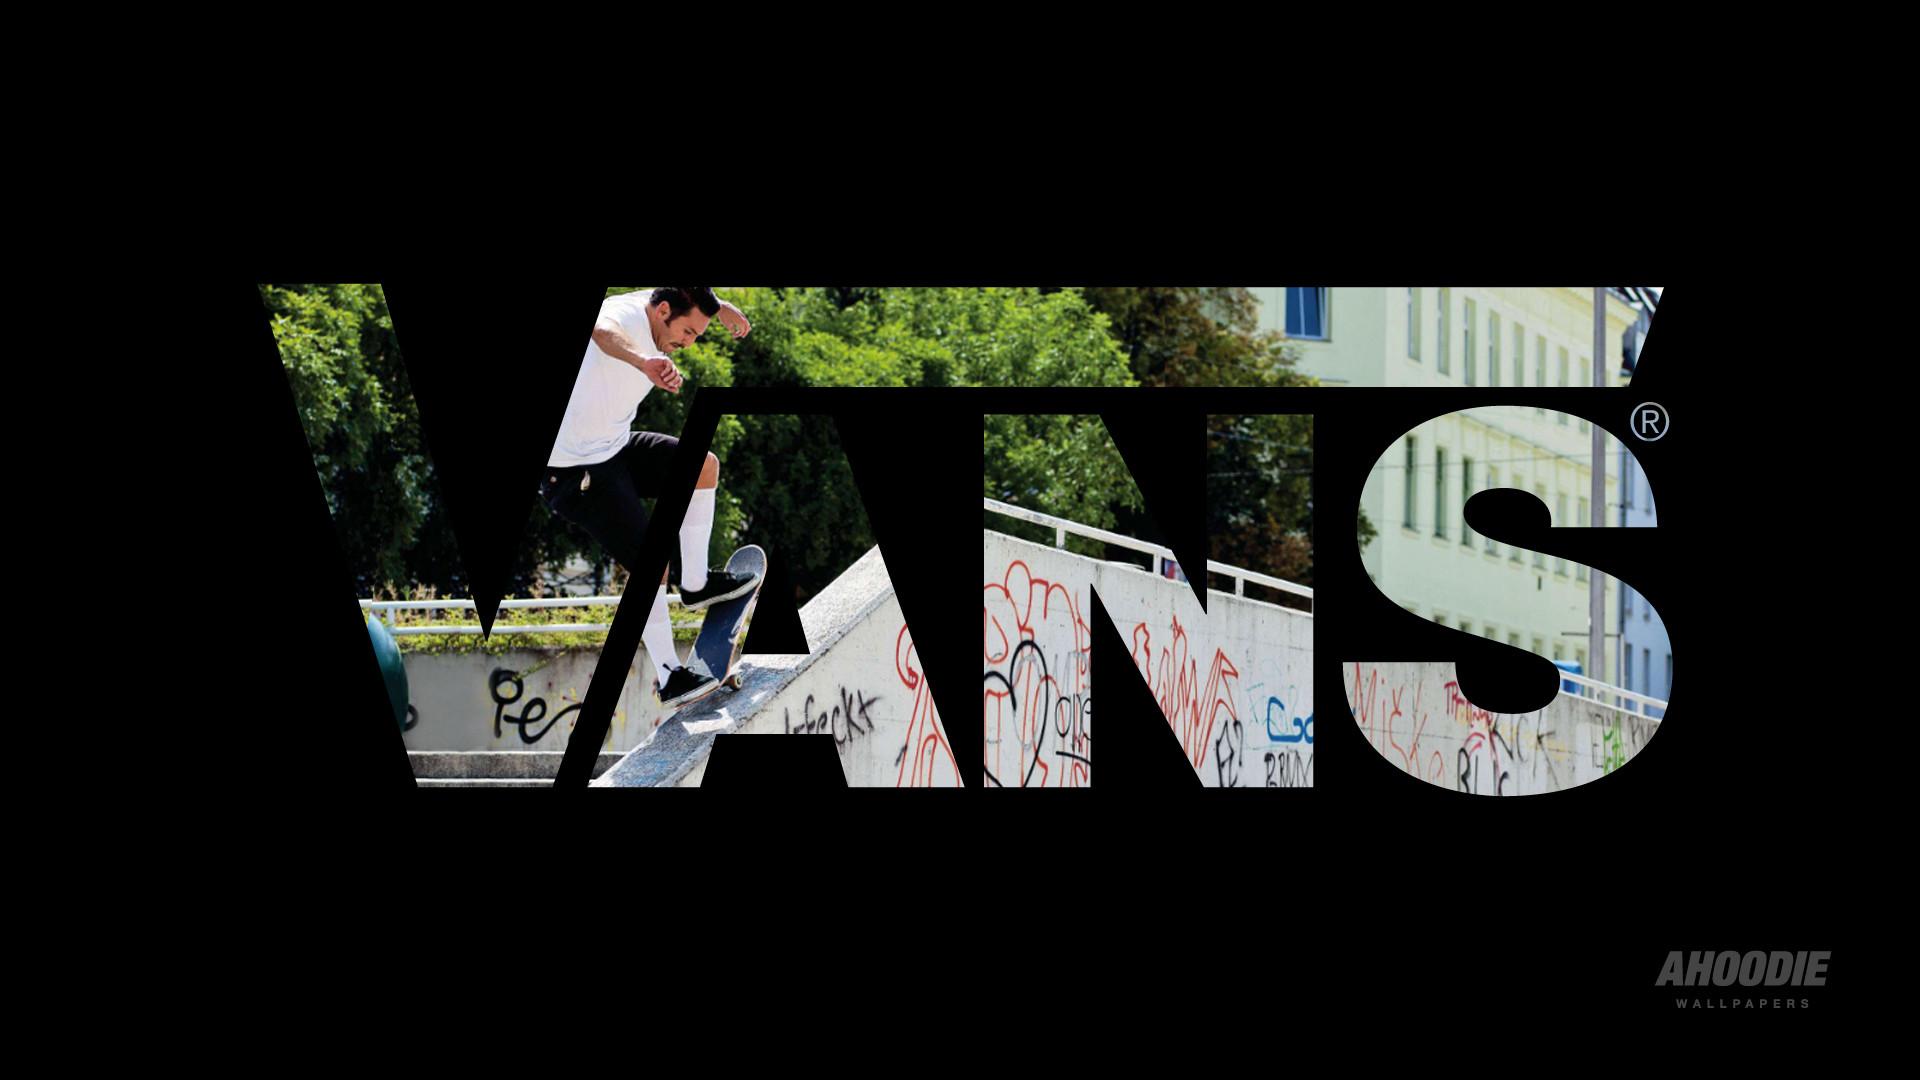 skateboard brand wallpaper hd 183��